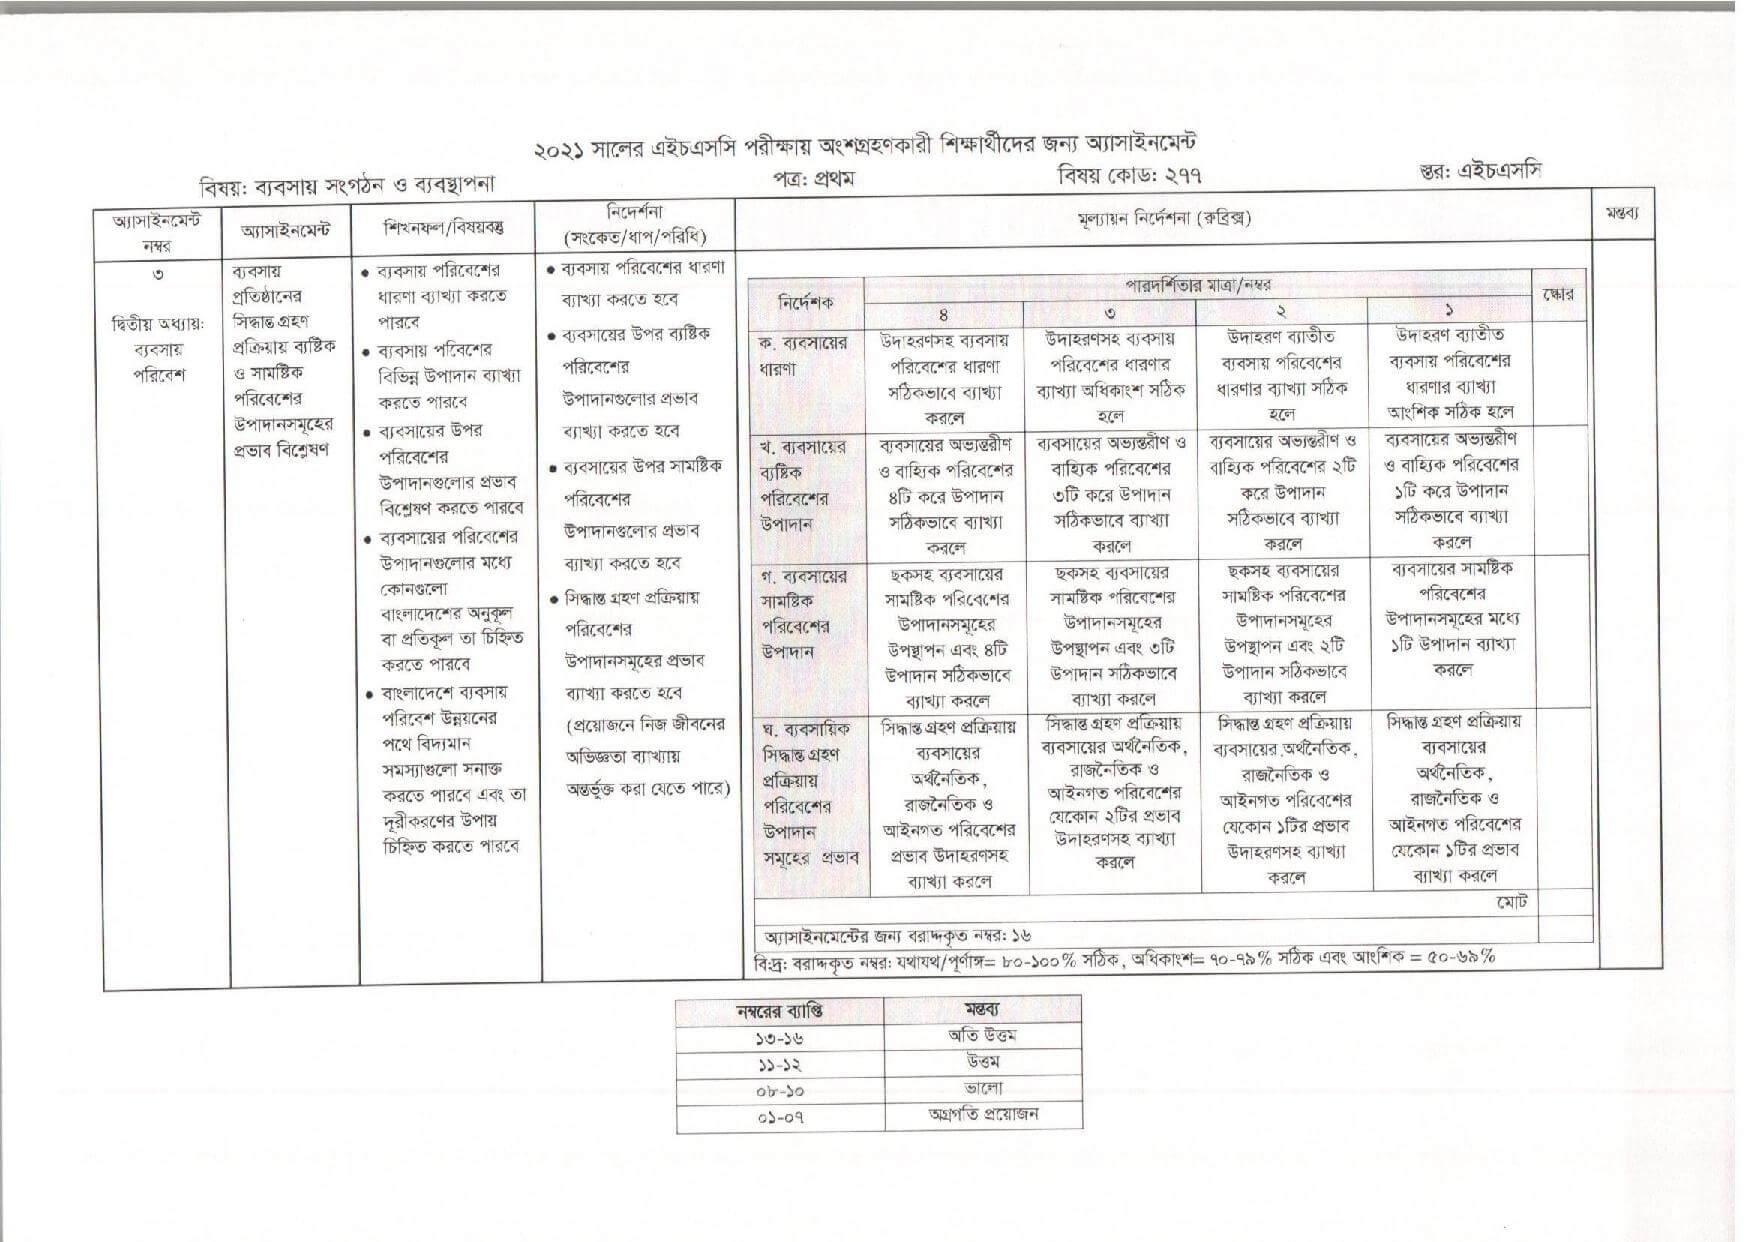 HSC 4th Week Bussiness Management Assignment